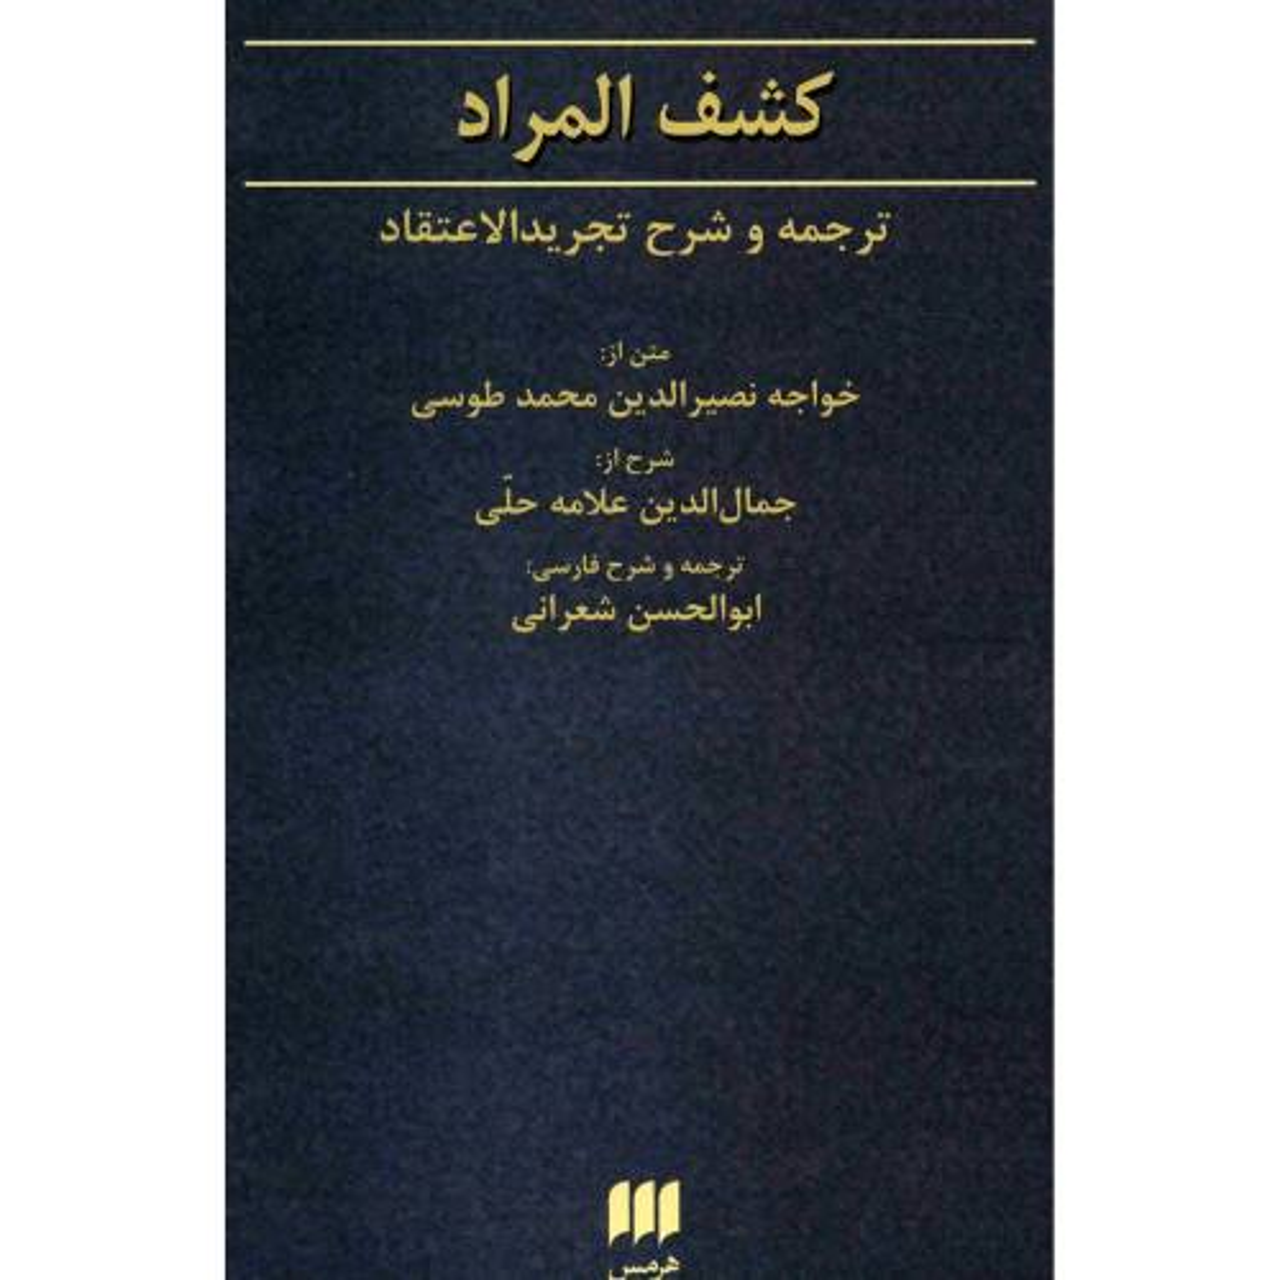 کتاب کشف المراد اثر خواجه نصیرالدین محمد طوسی